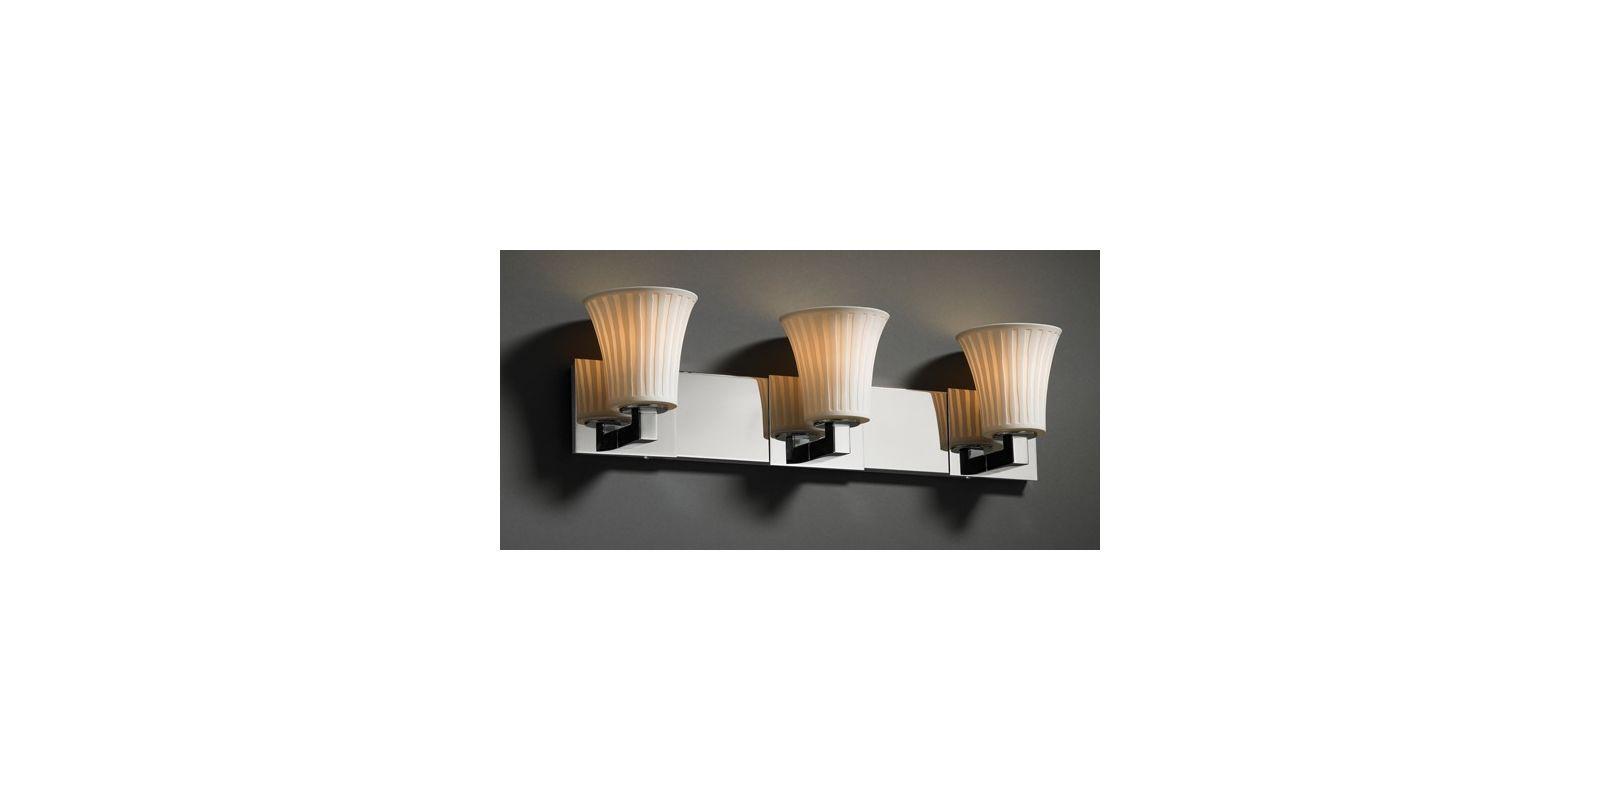 Justice design group por 8923 abrs antique brass bathroom light - Justice design group bathroom lighting ...